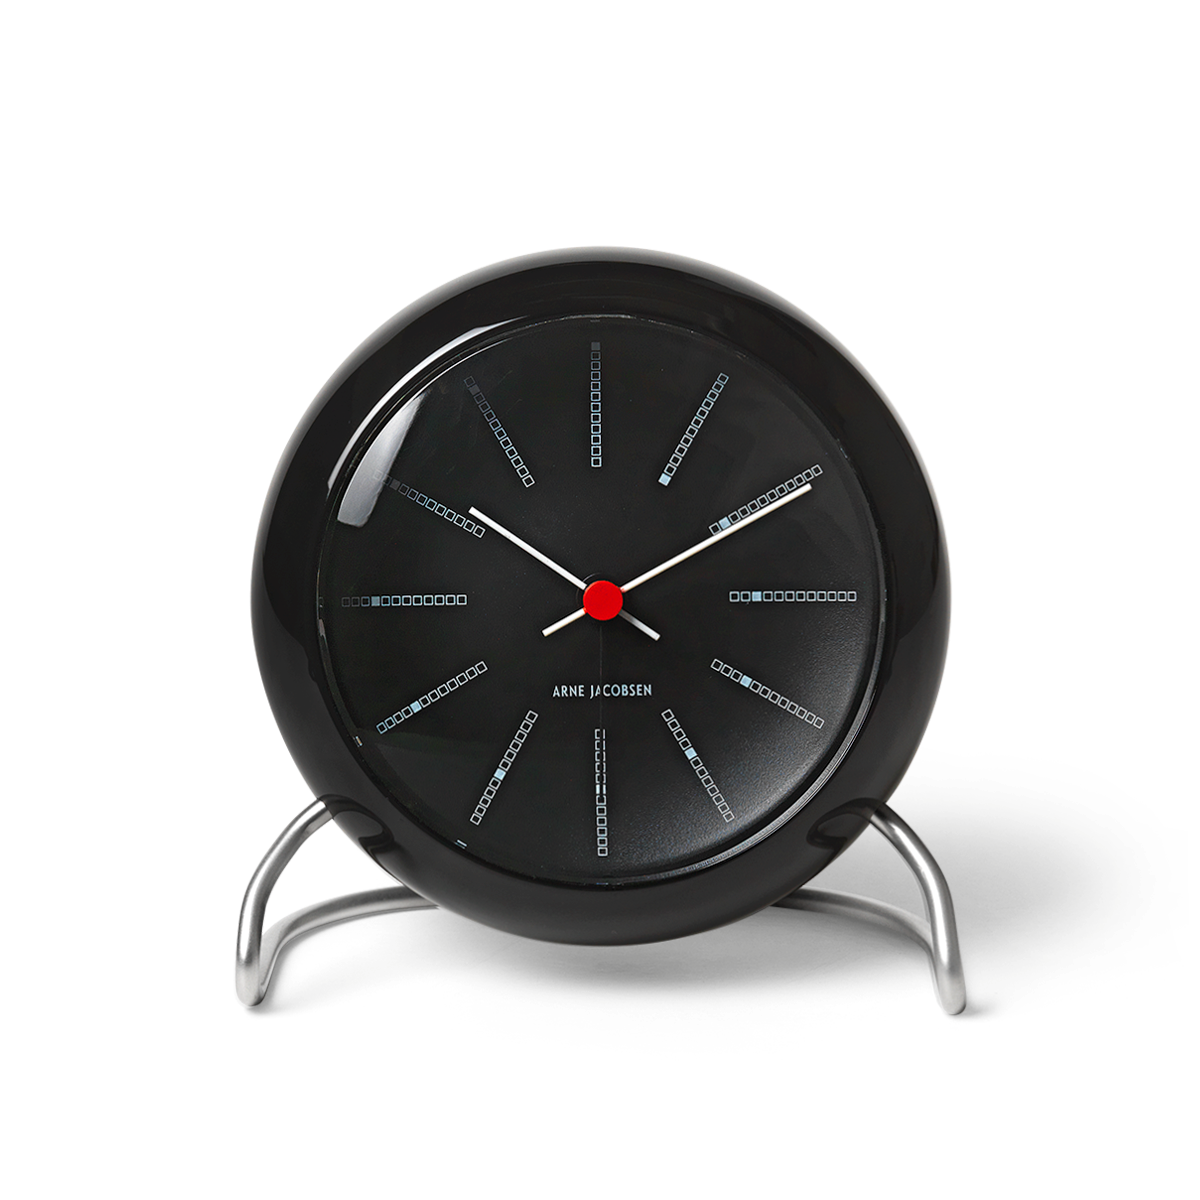 Arne Jacobsen - Bankers Table Clock  - Black (43680)